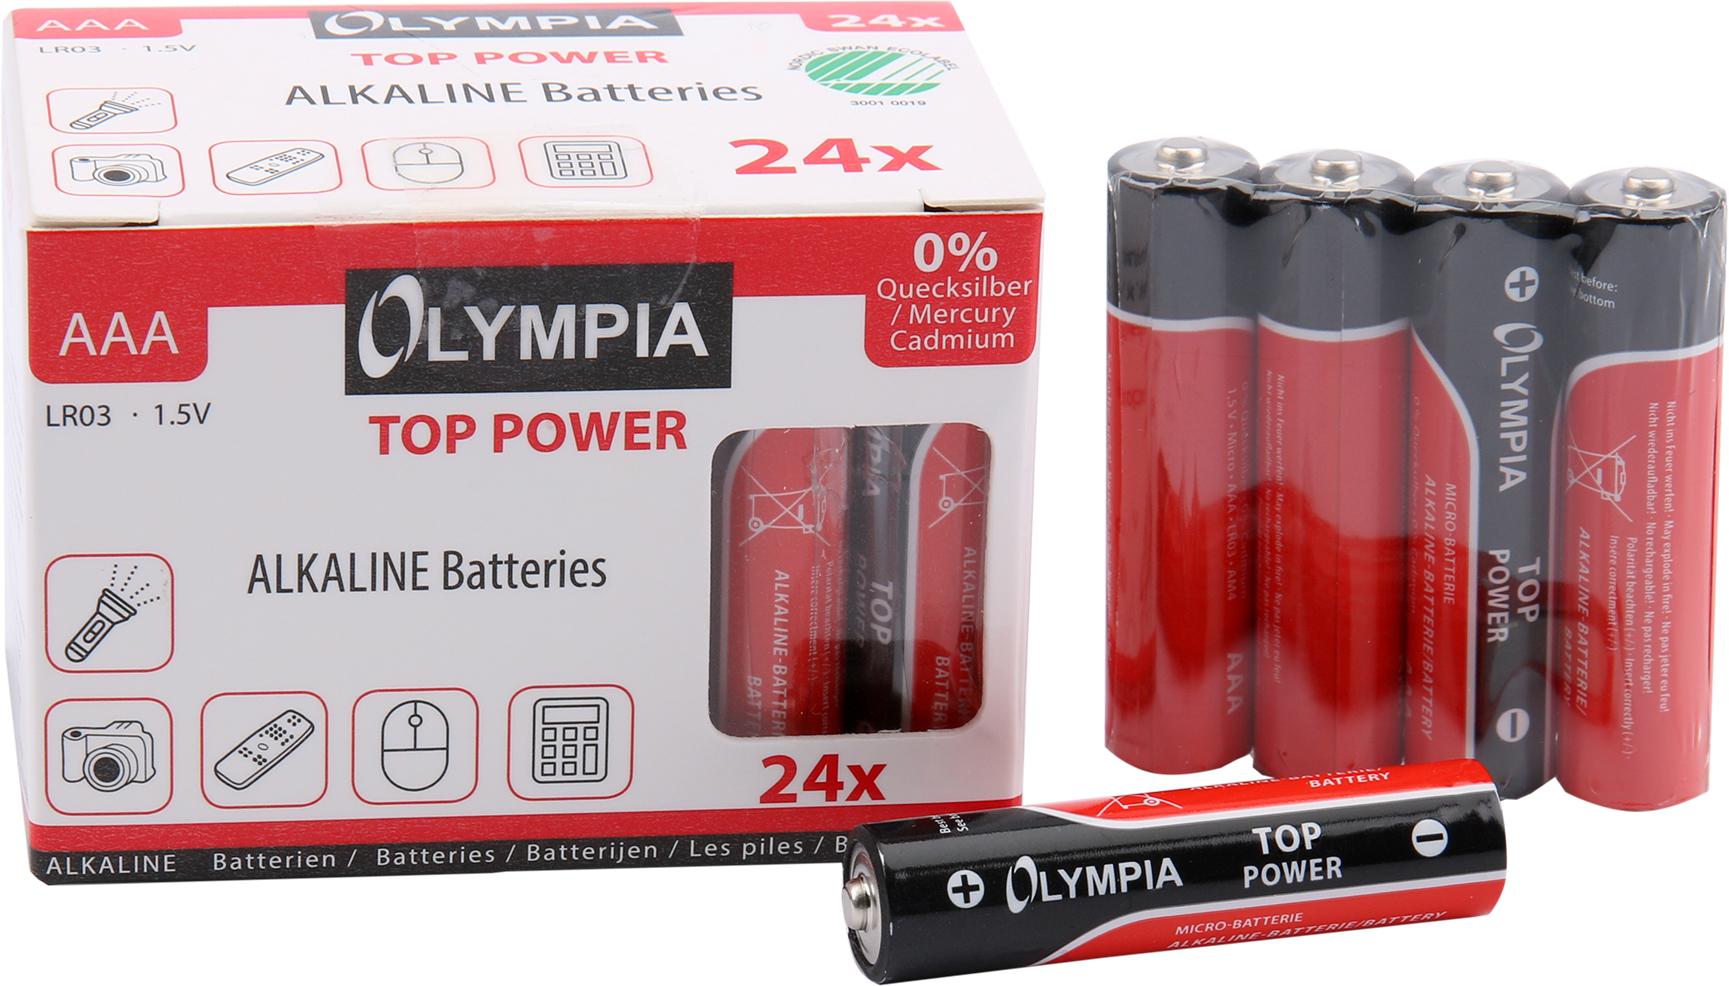 Olympia Alkaline Batterien AAA 24er Pack - Batterie - Batterie